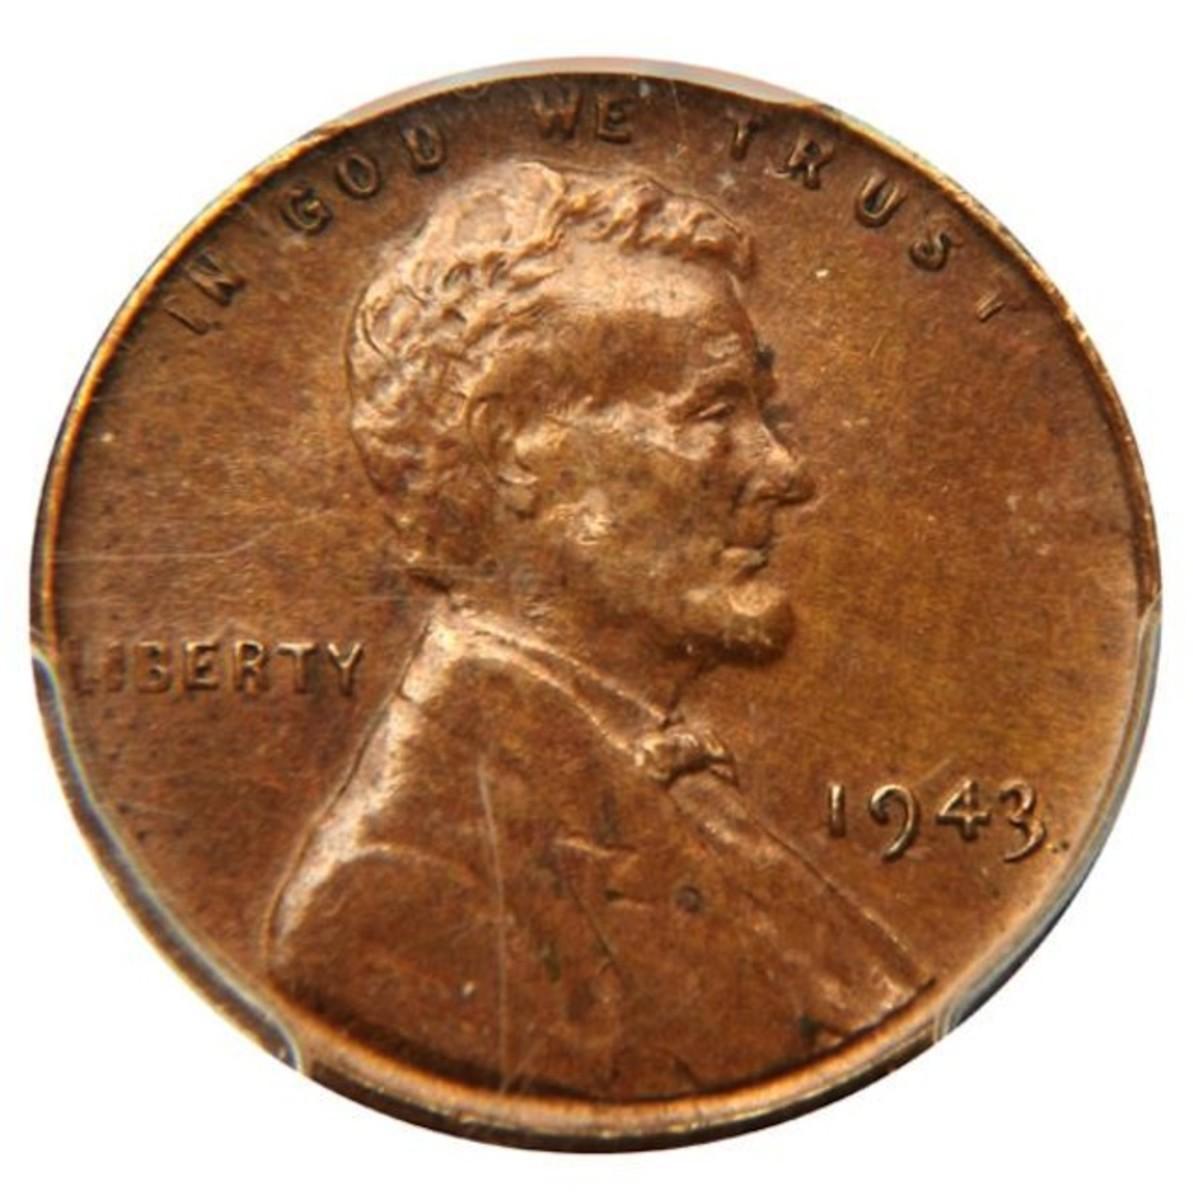 This 1943 bronze mint error cent in AU-55 brought $329,000.